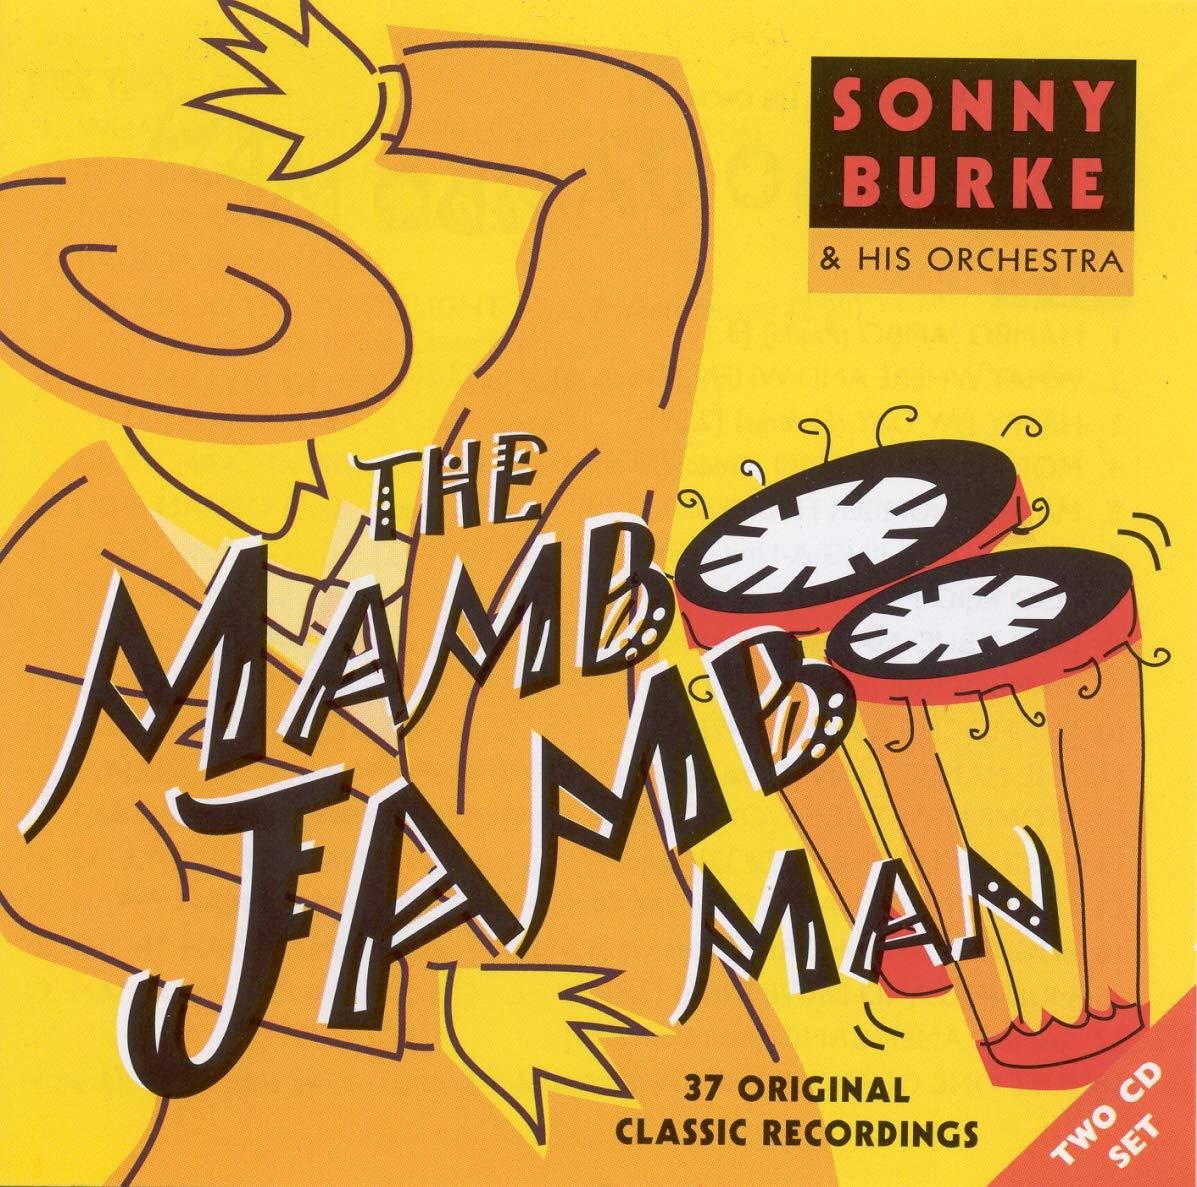 The Special price Mambo Jambo Man - 37 Recordings Los Angeles Mall Classic R Original ORIGINAL